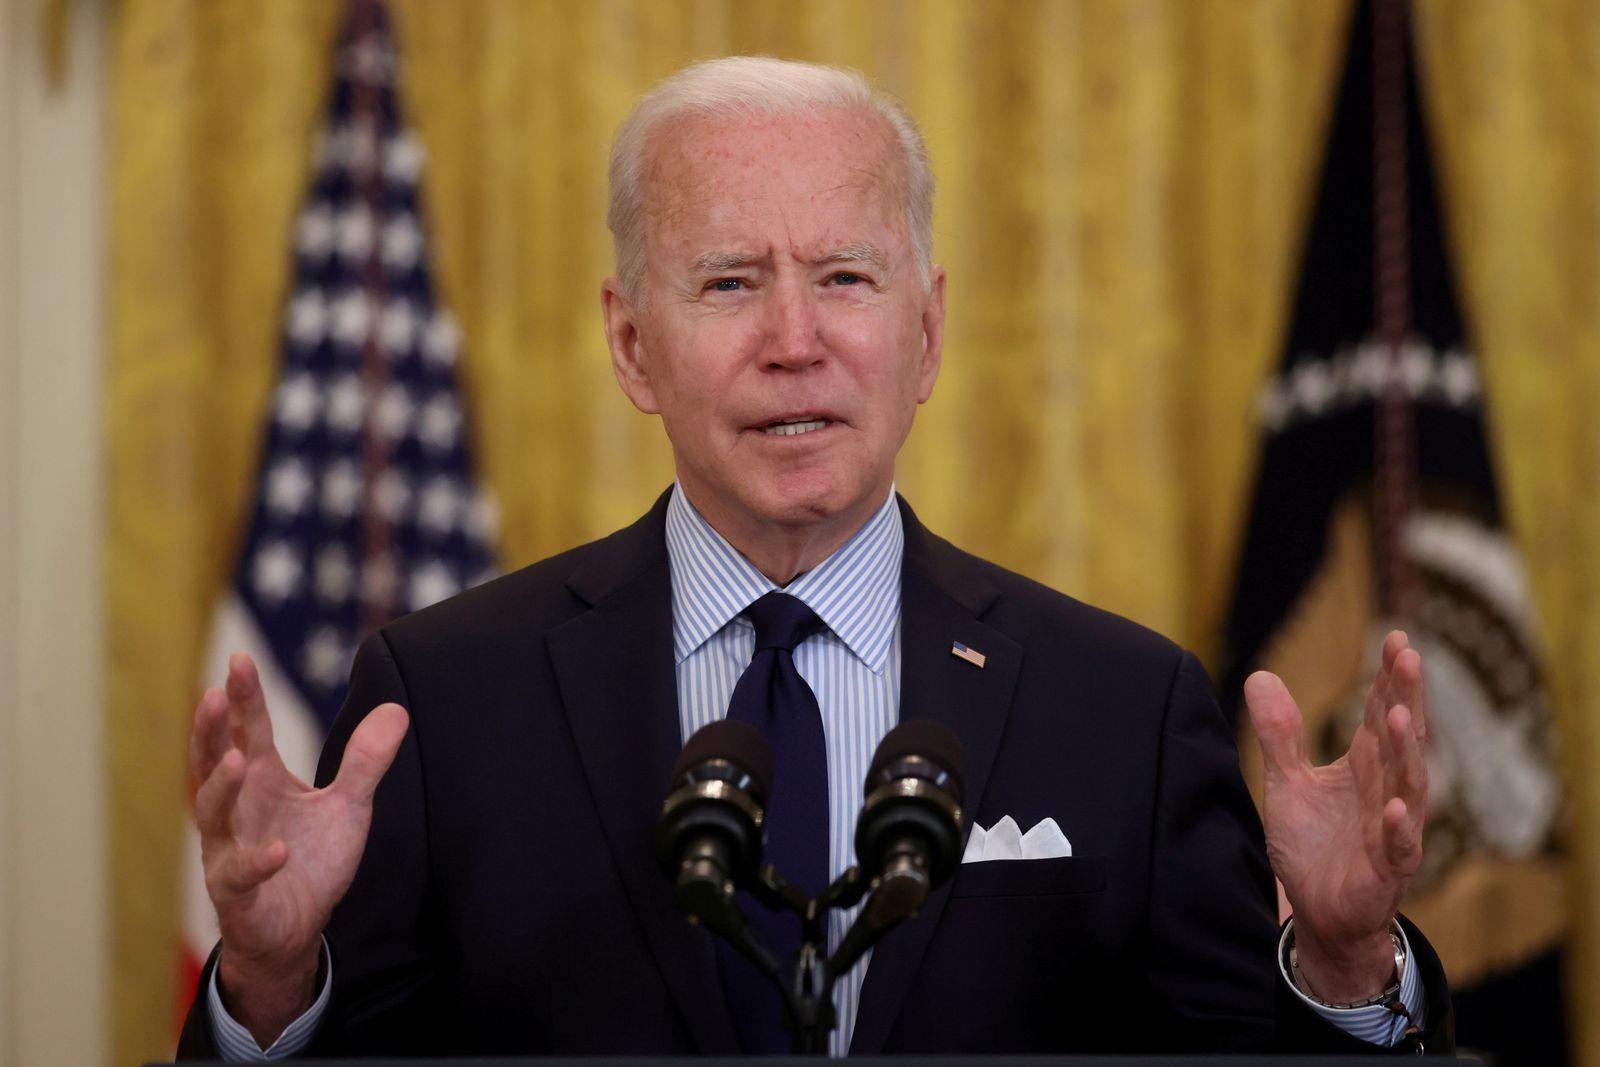 FILE PHOTO: U.S. President Joe Biden delivers remarks on the April jobs report